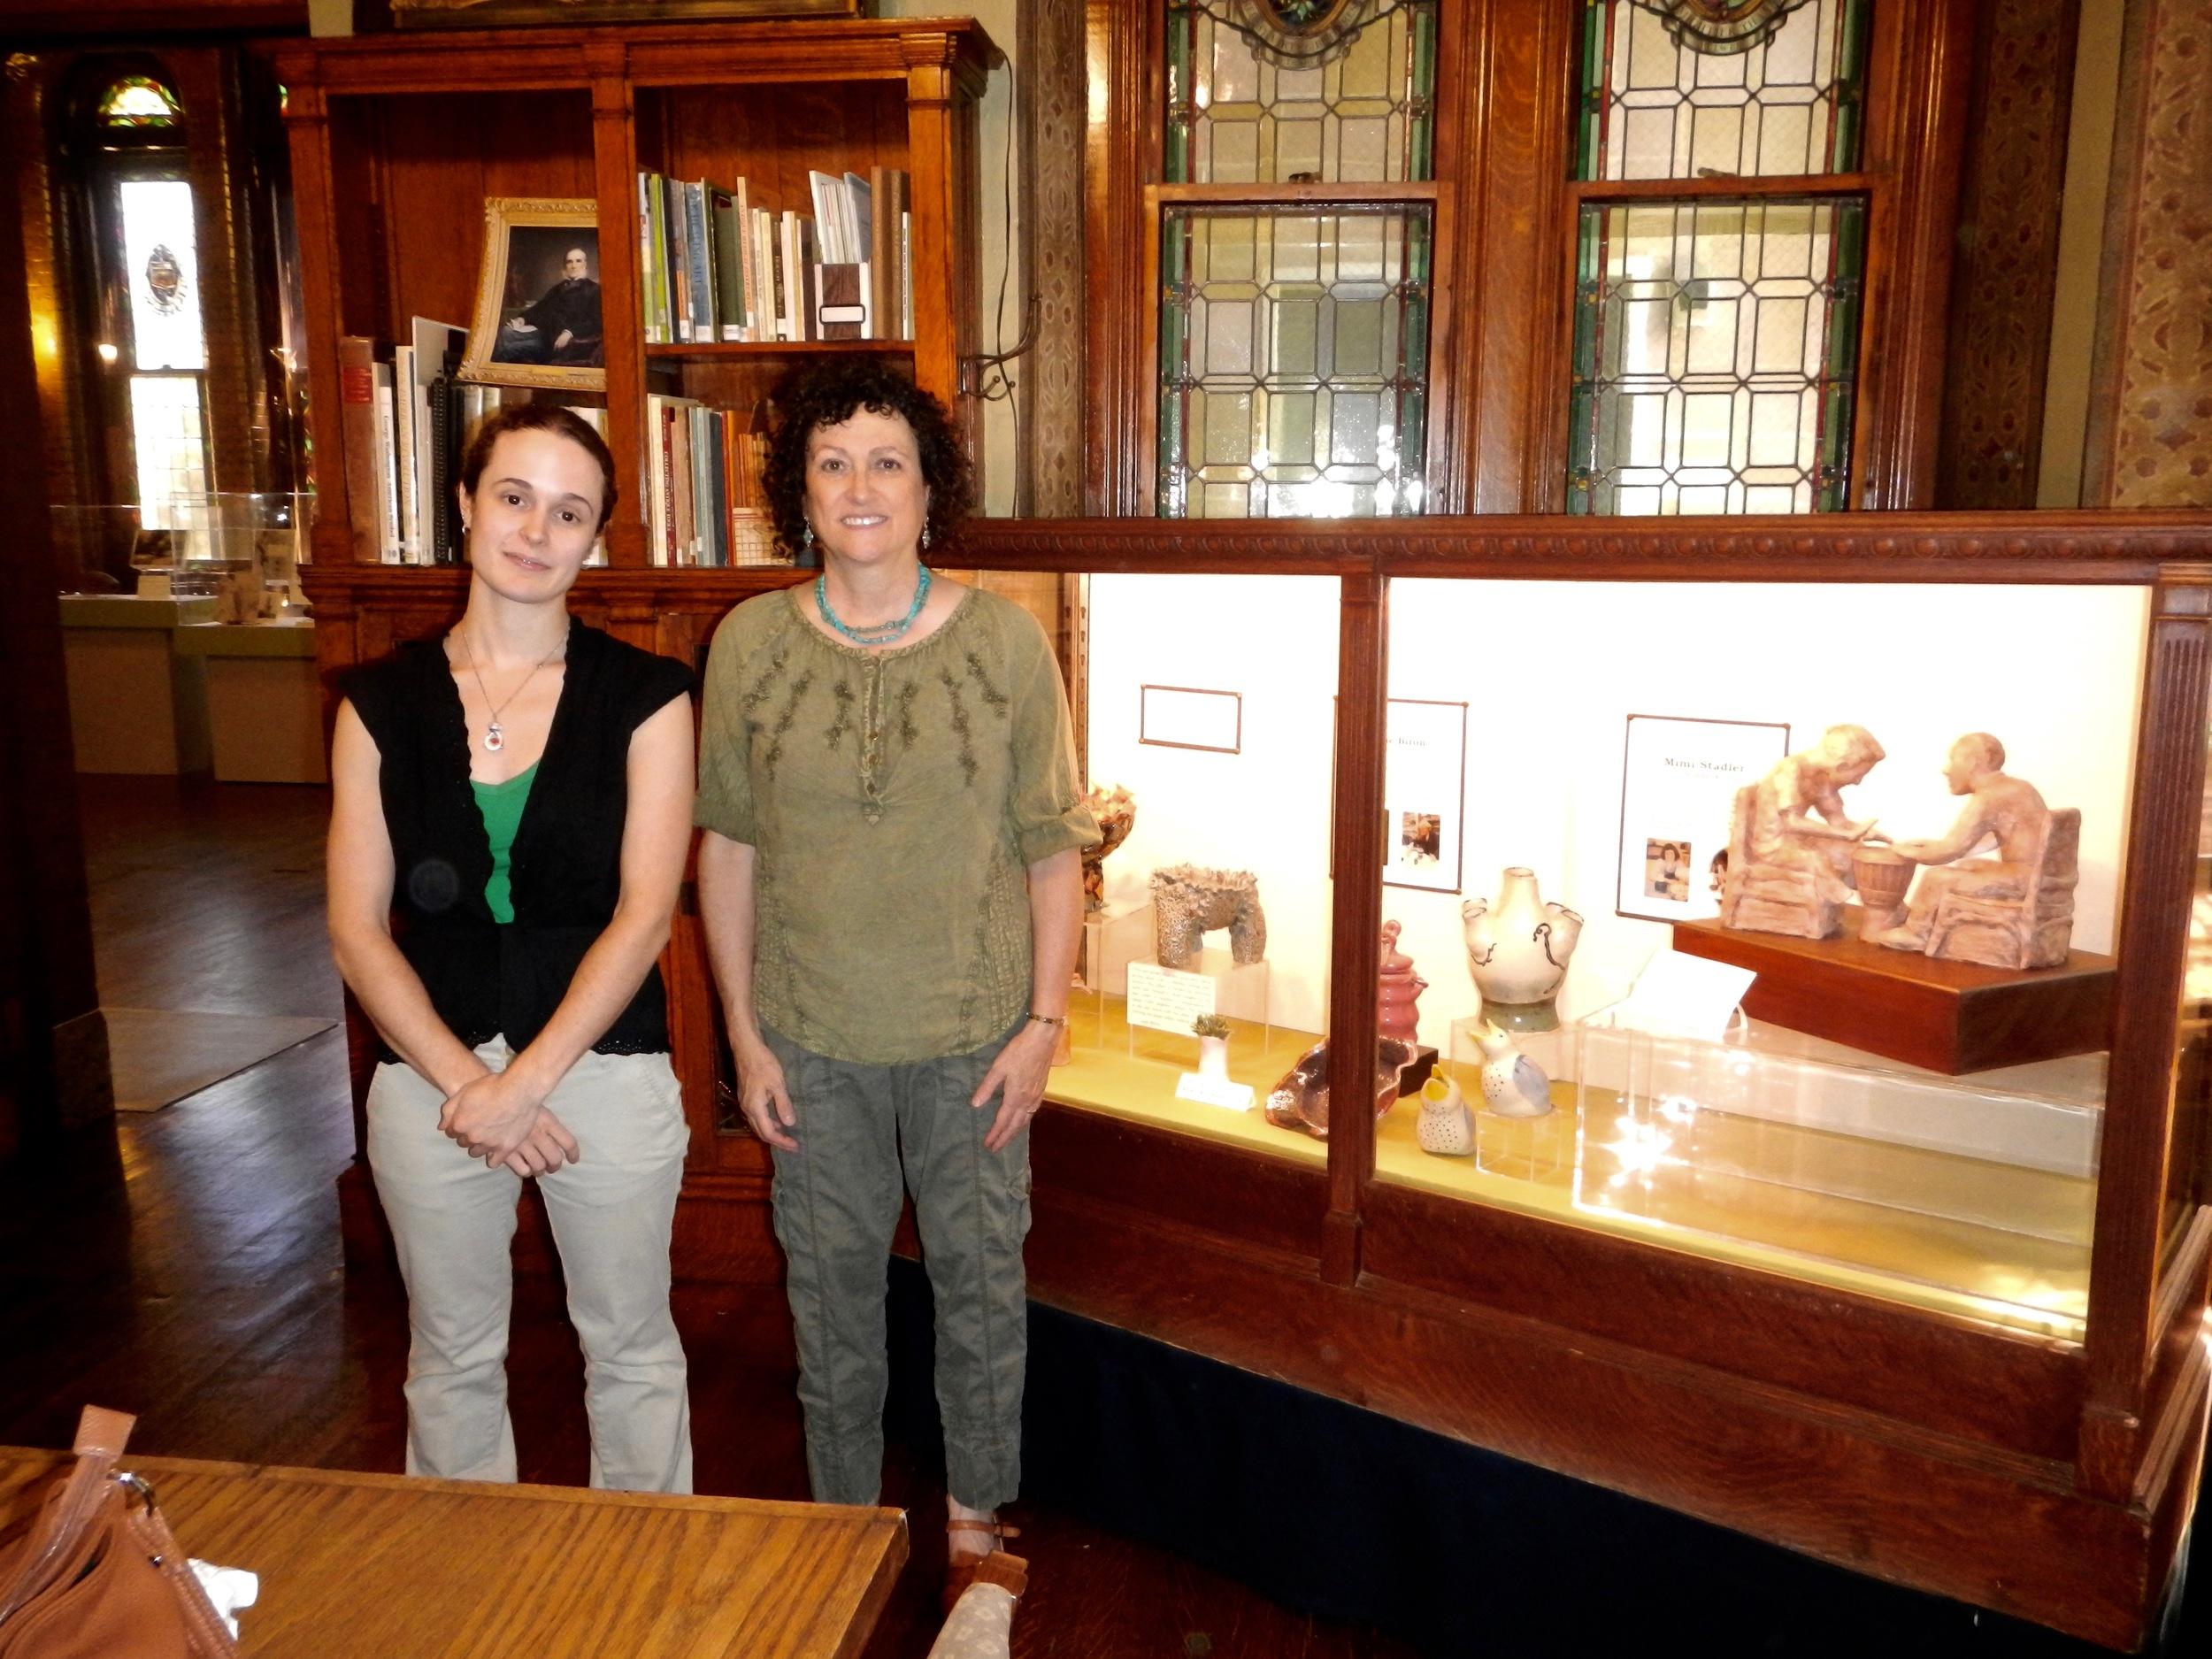 Mimi Stadler (right) and Kristin Lapos, Curator at METC (Photo Mimi Stadler 2016)